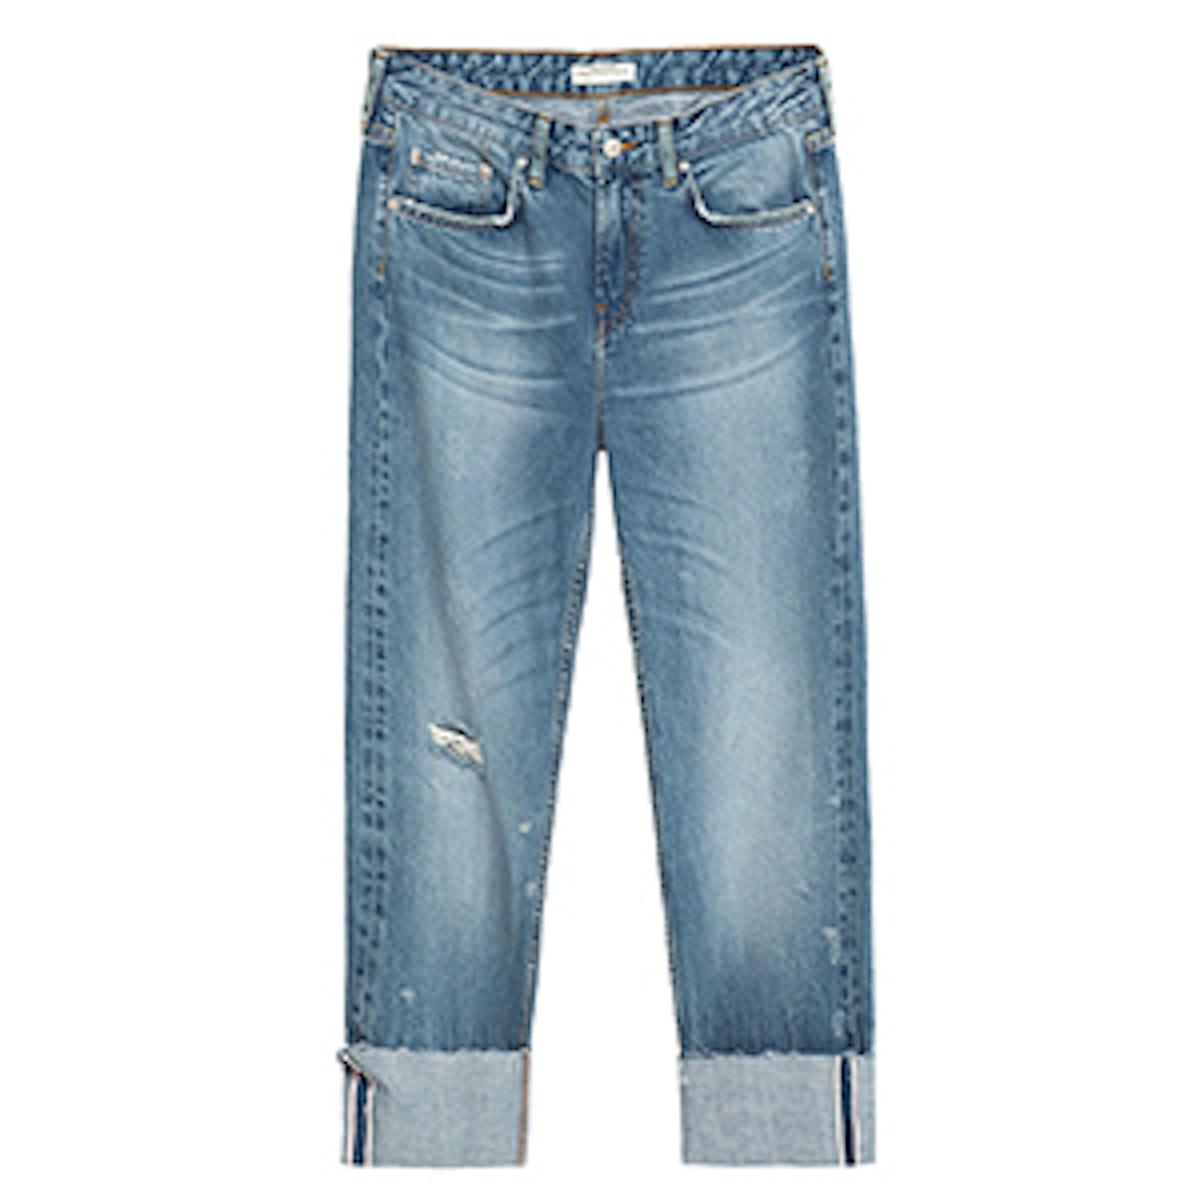 Boyfit Selvedge Jeans